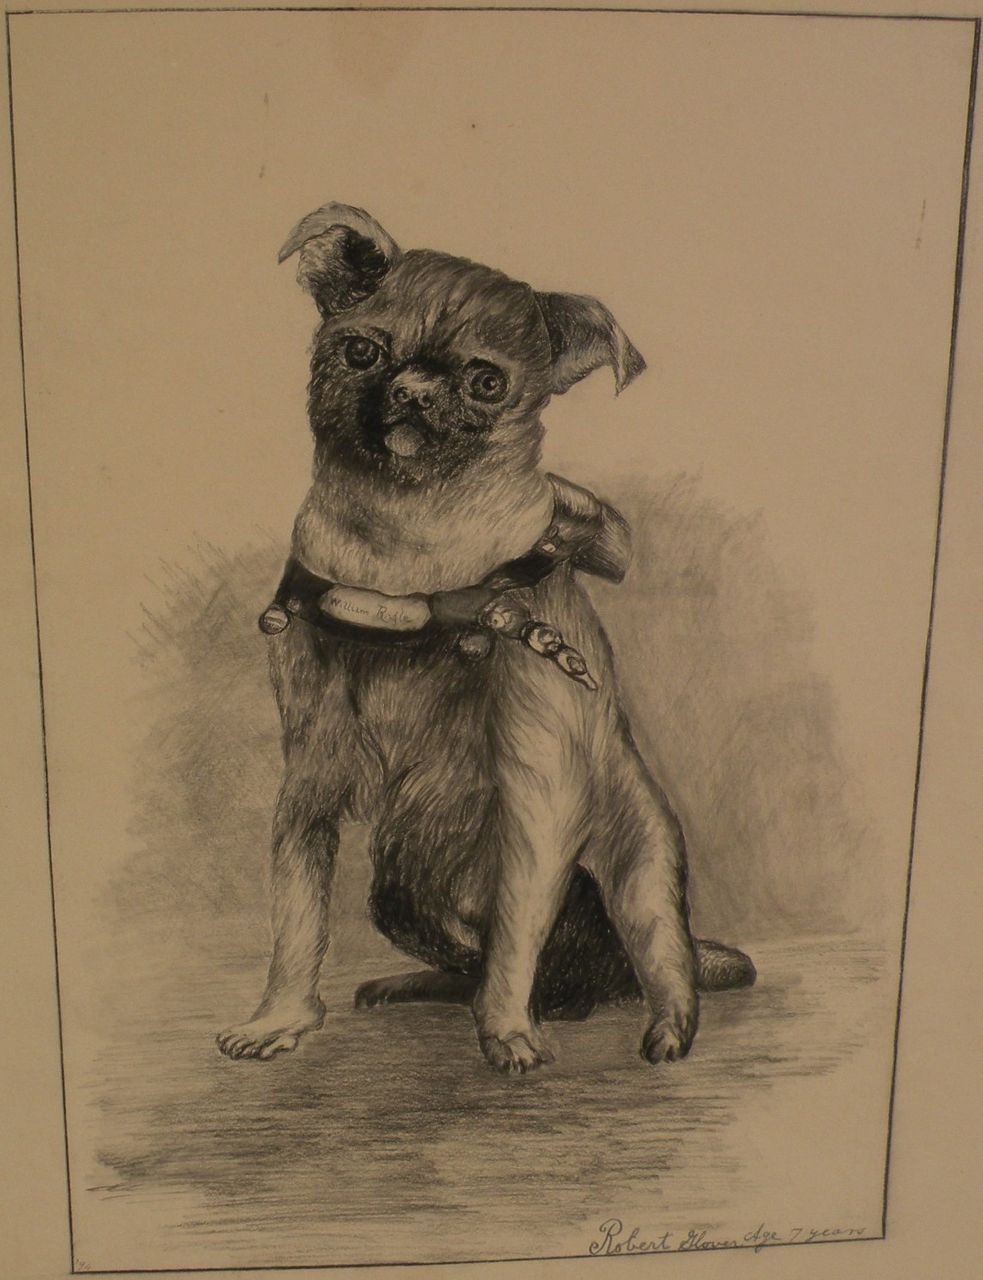 Dog art original English black ink drawing of a pug dated 1894